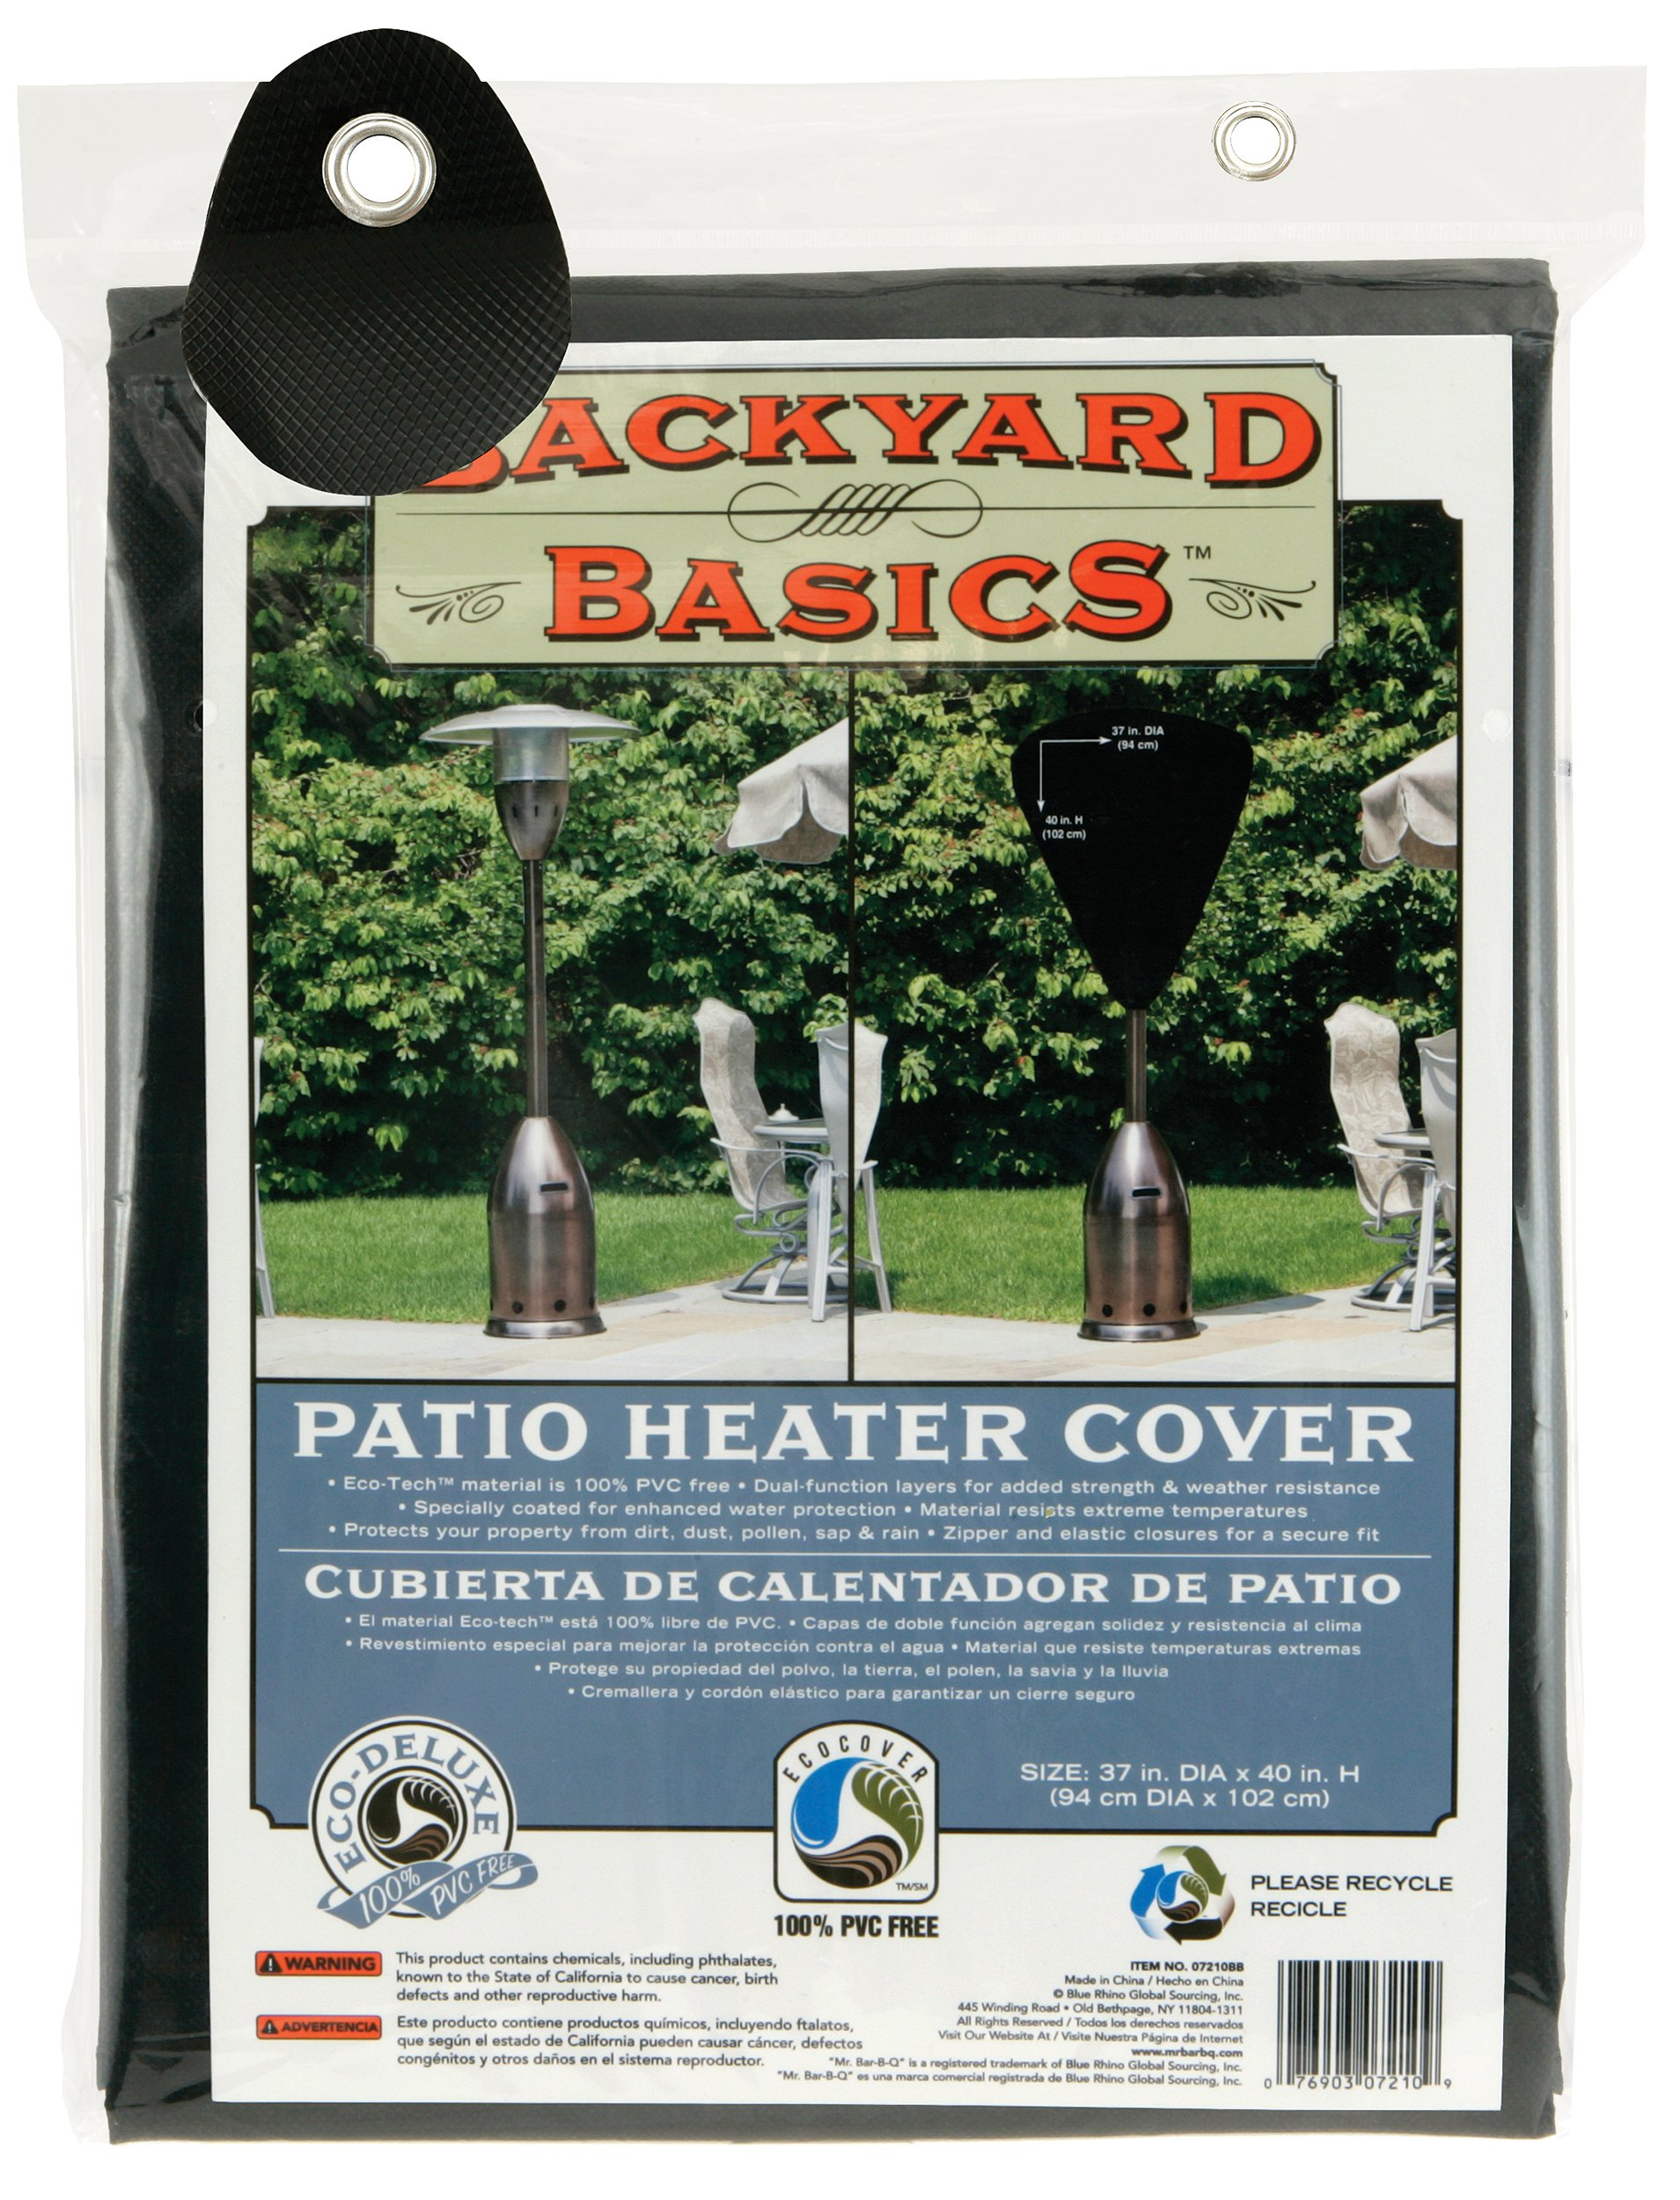 Backyard Basics Patio Heater Cover by Backyard Basics